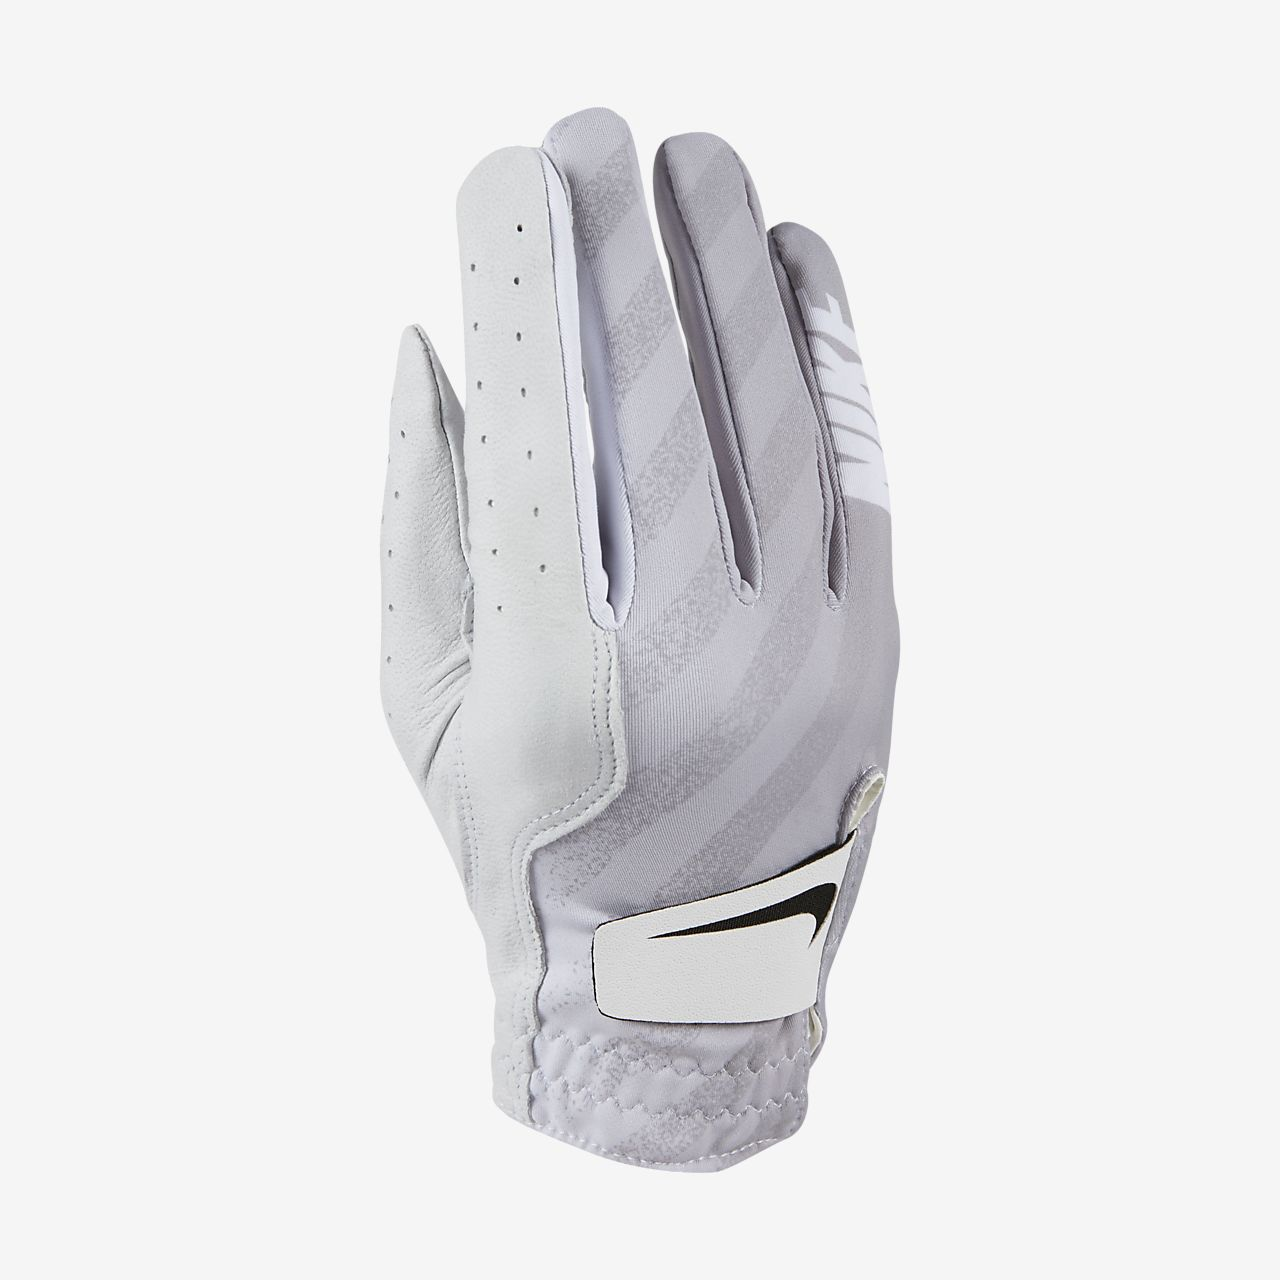 Guante de golf para mujer Nike Tech (talla normal, derecho)